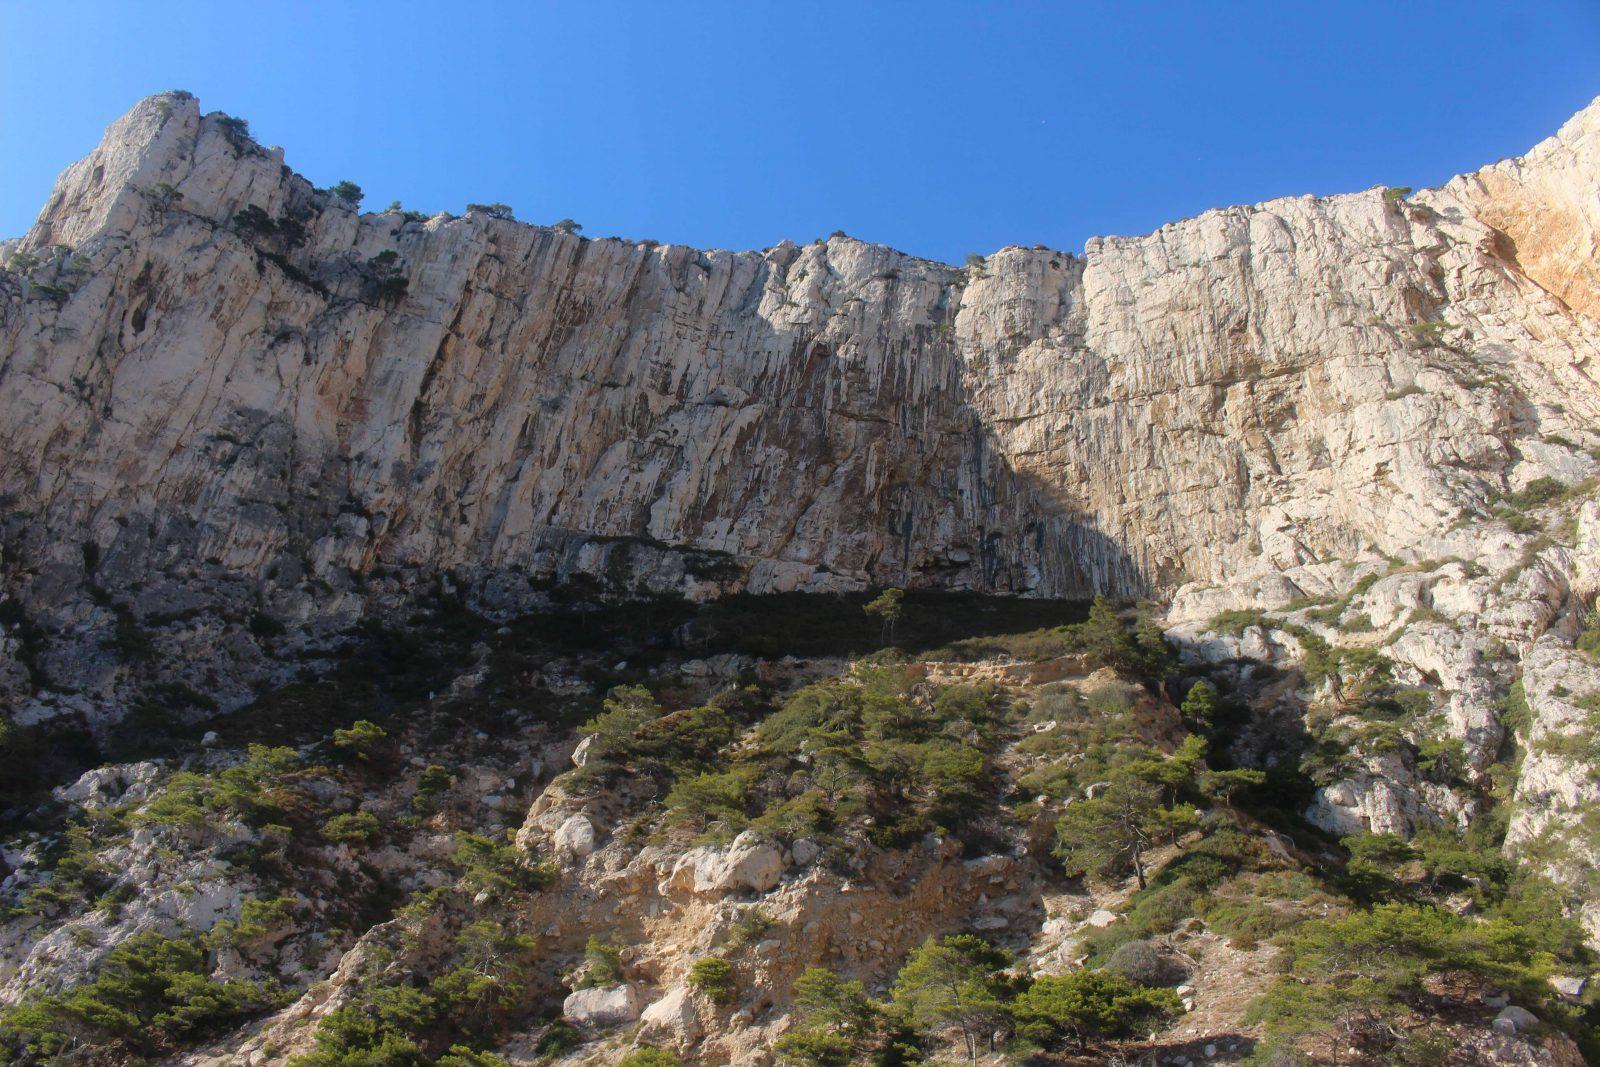 Les hautes falaises des calanques de Cassis